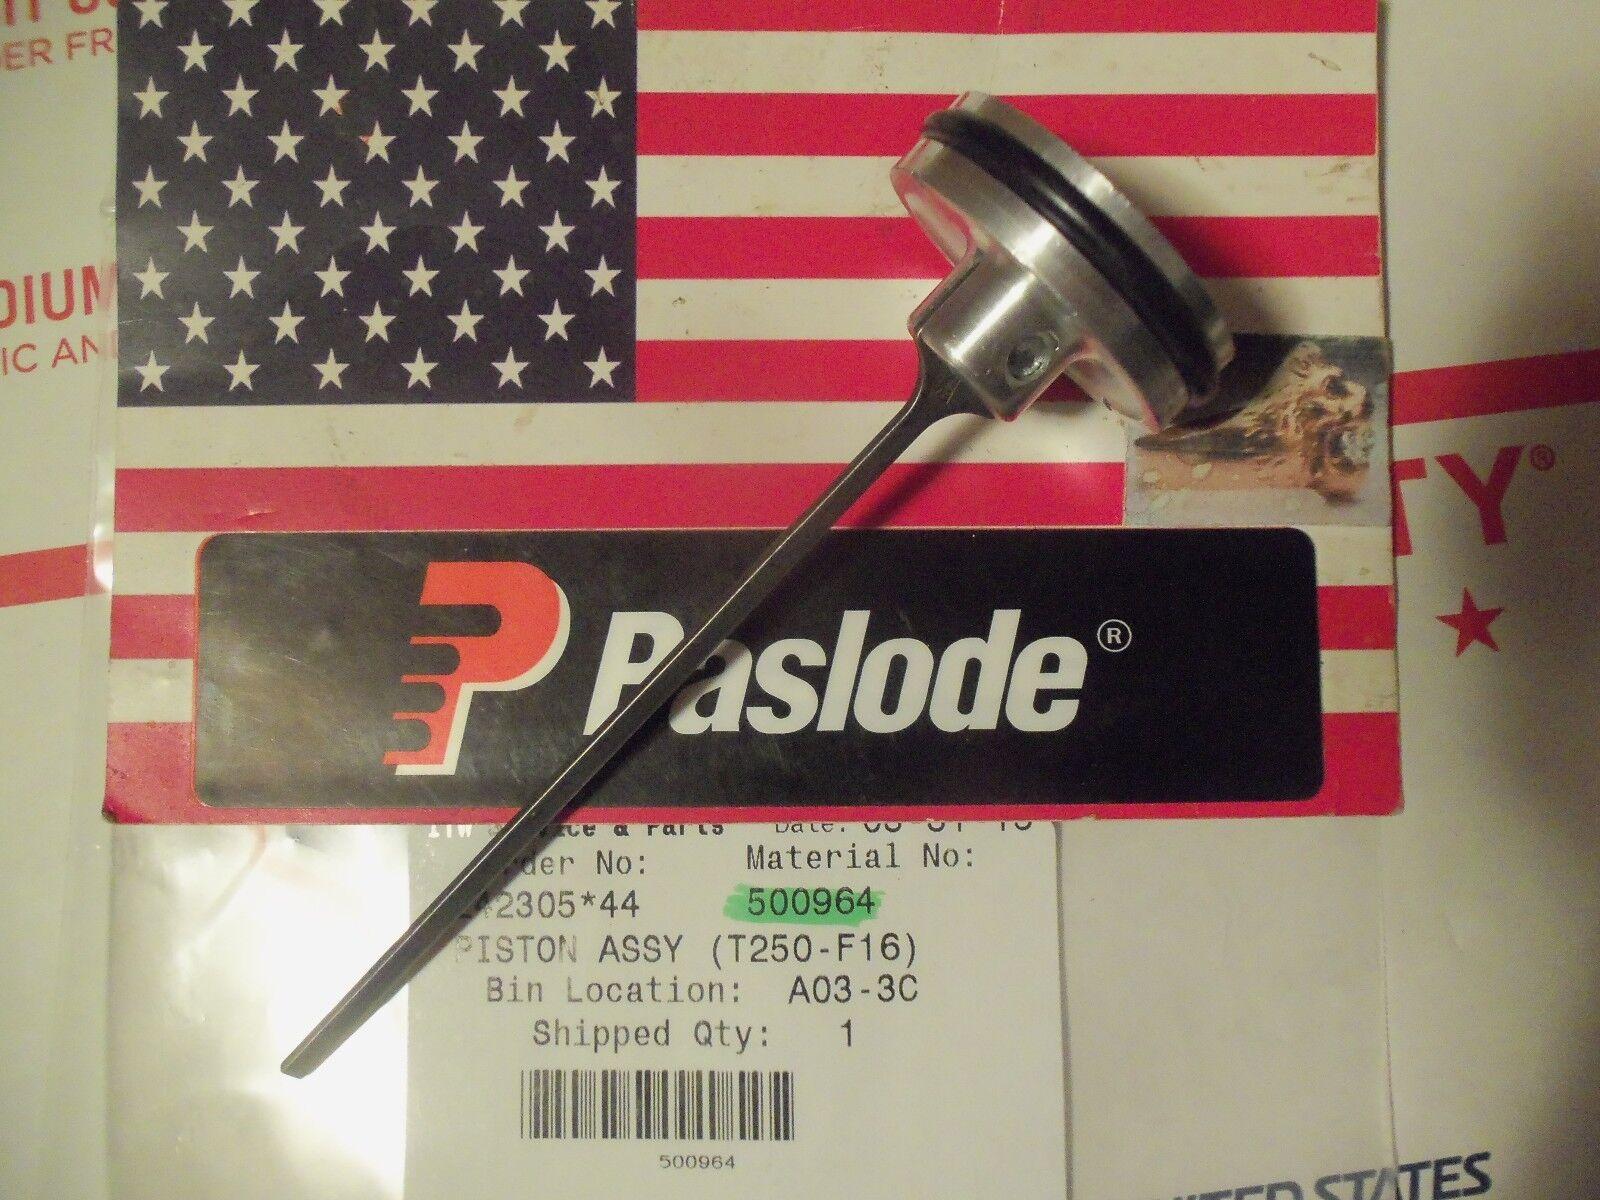 500964 liondiamondtools NEW Paslode Part # 500964  PISTON ASSY (T250-F16)